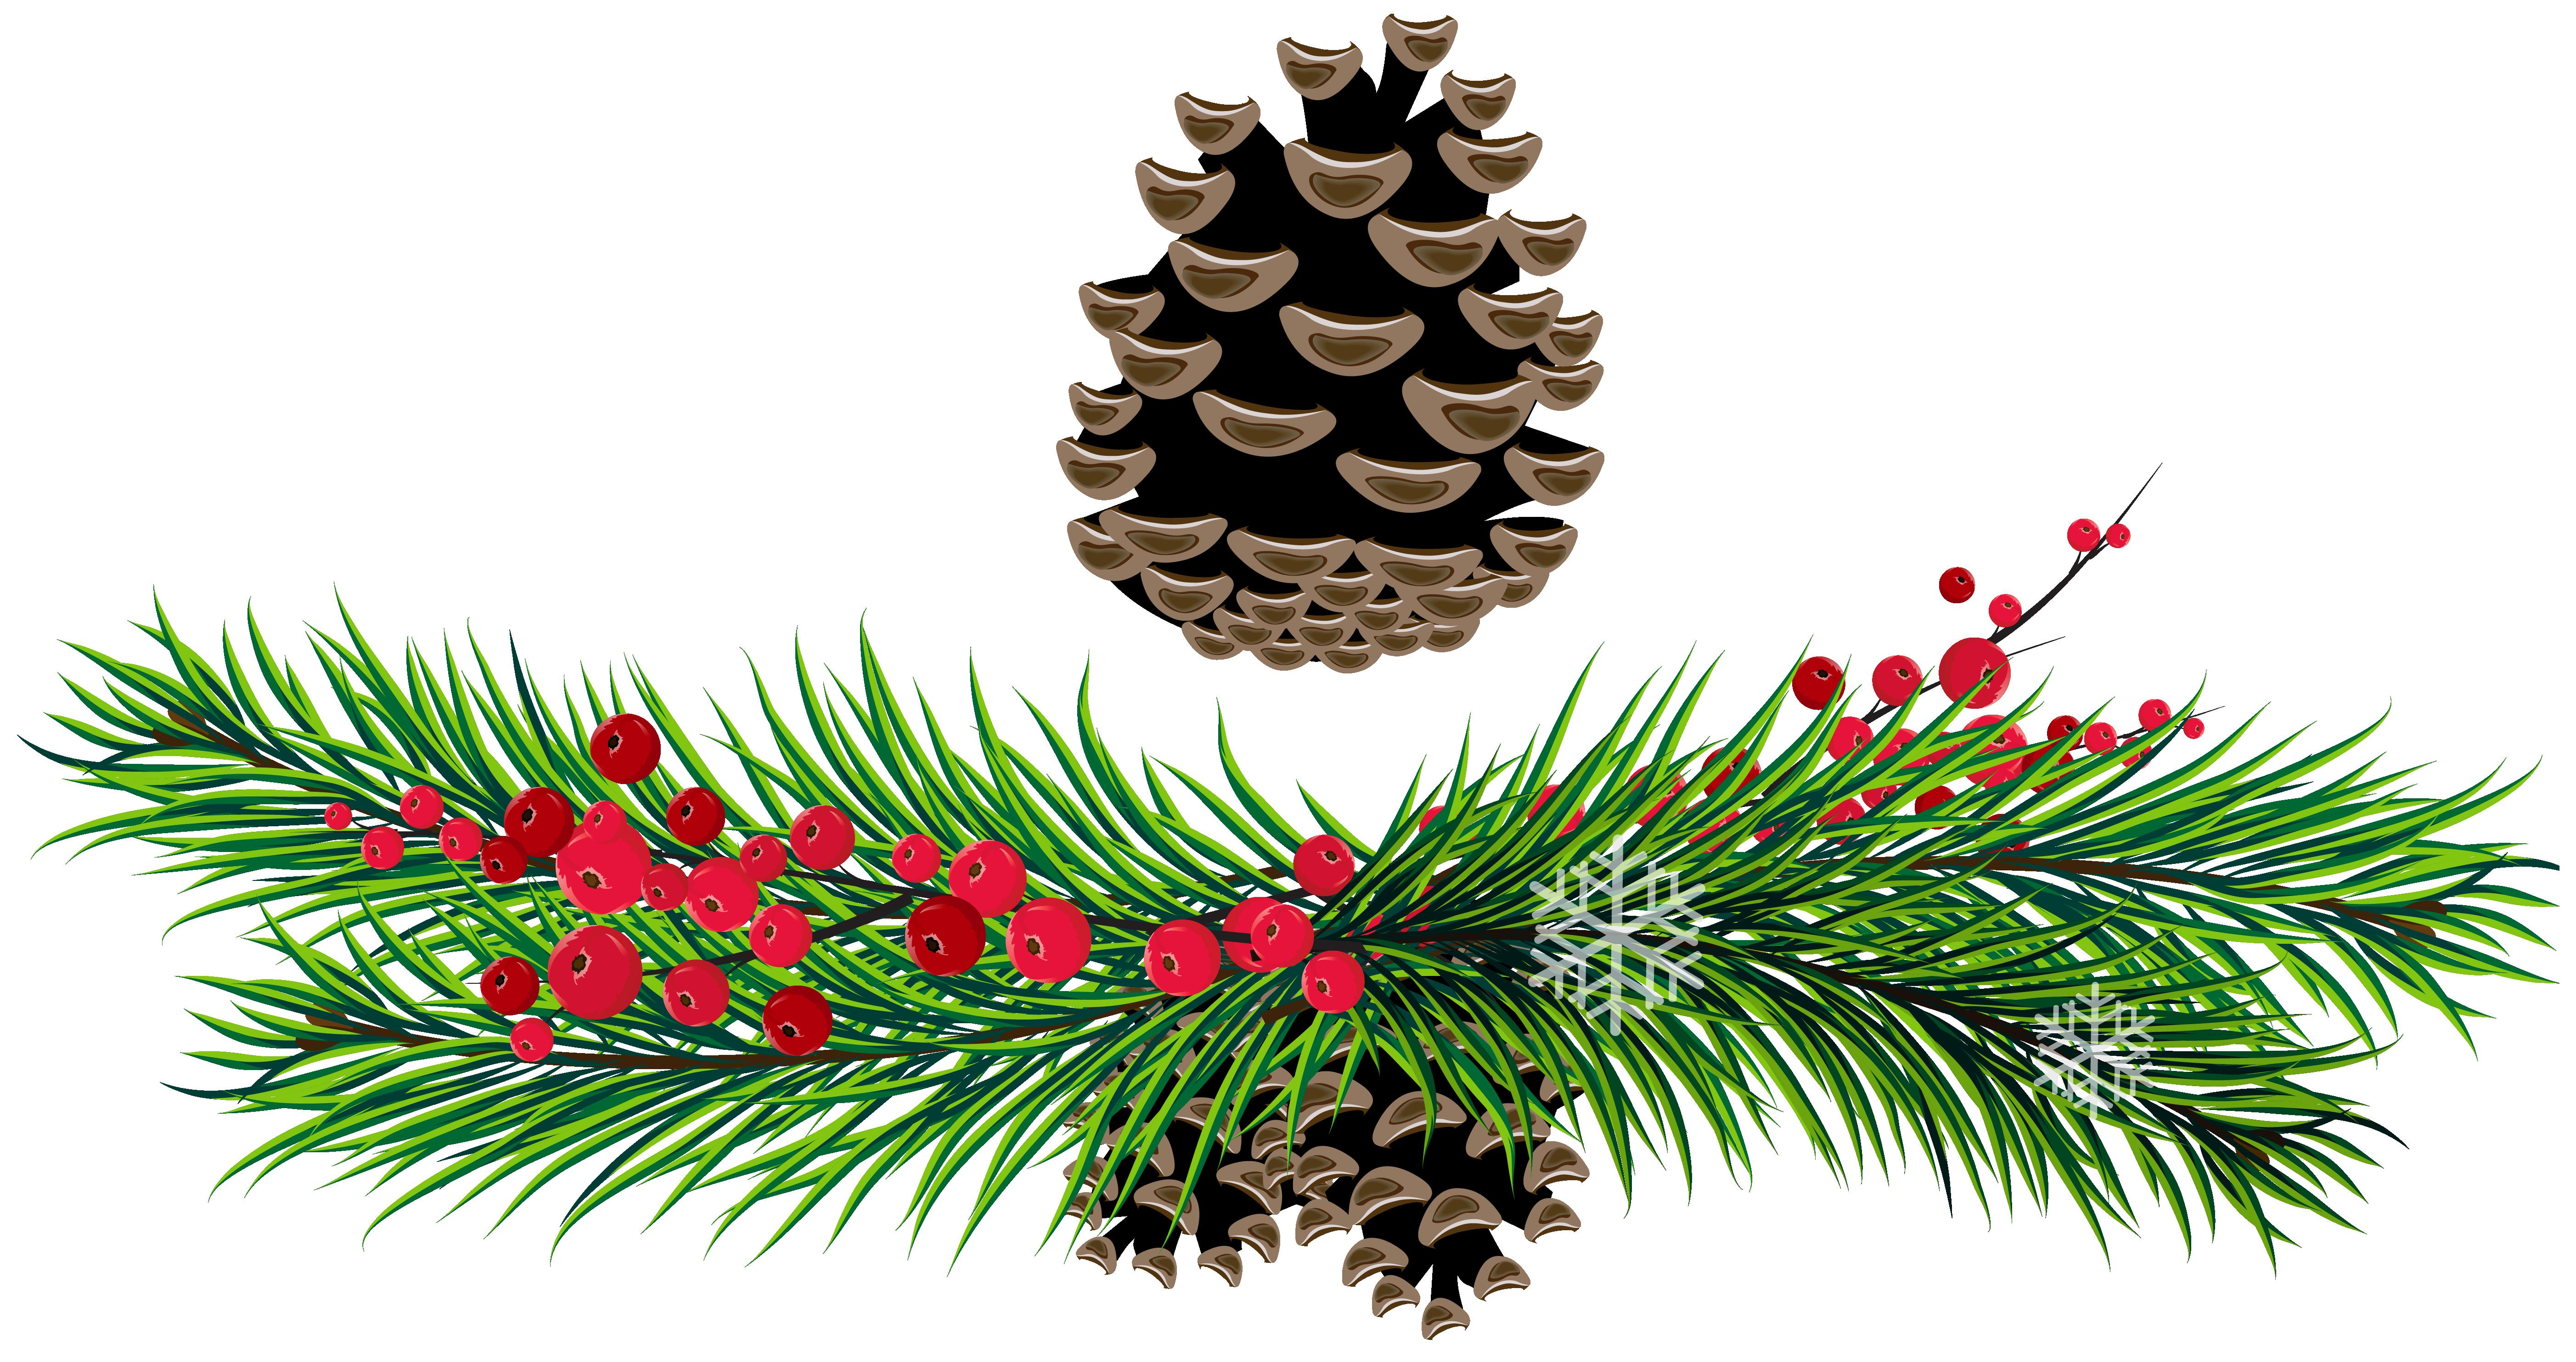 5610x2967 Pine Clipart Pine Tree Branch